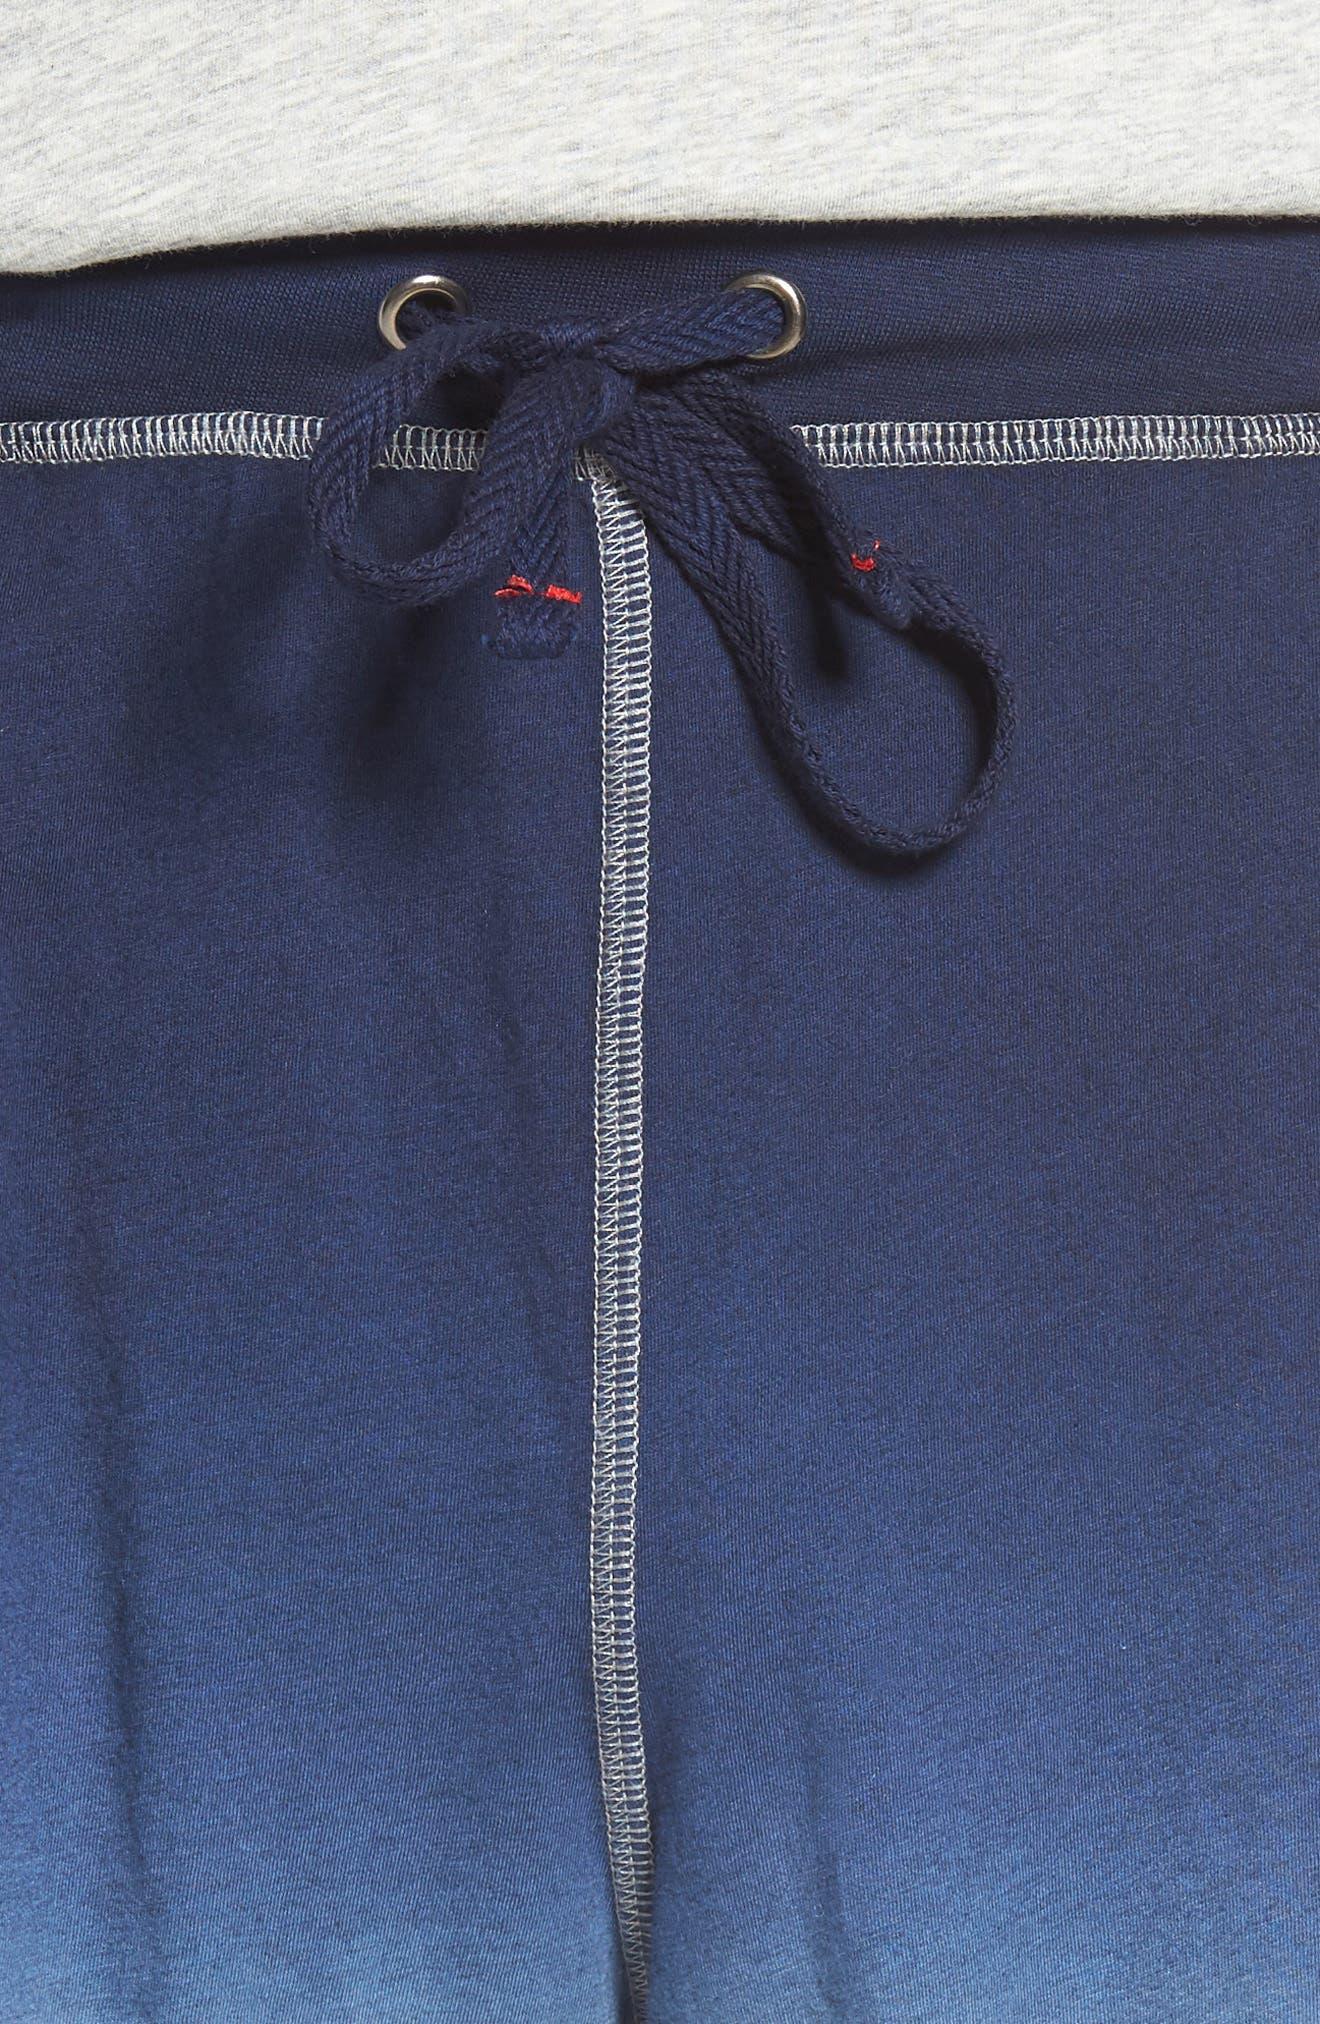 Dip Dye Lounge Shorts,                             Alternate thumbnail 4, color,                             Navy